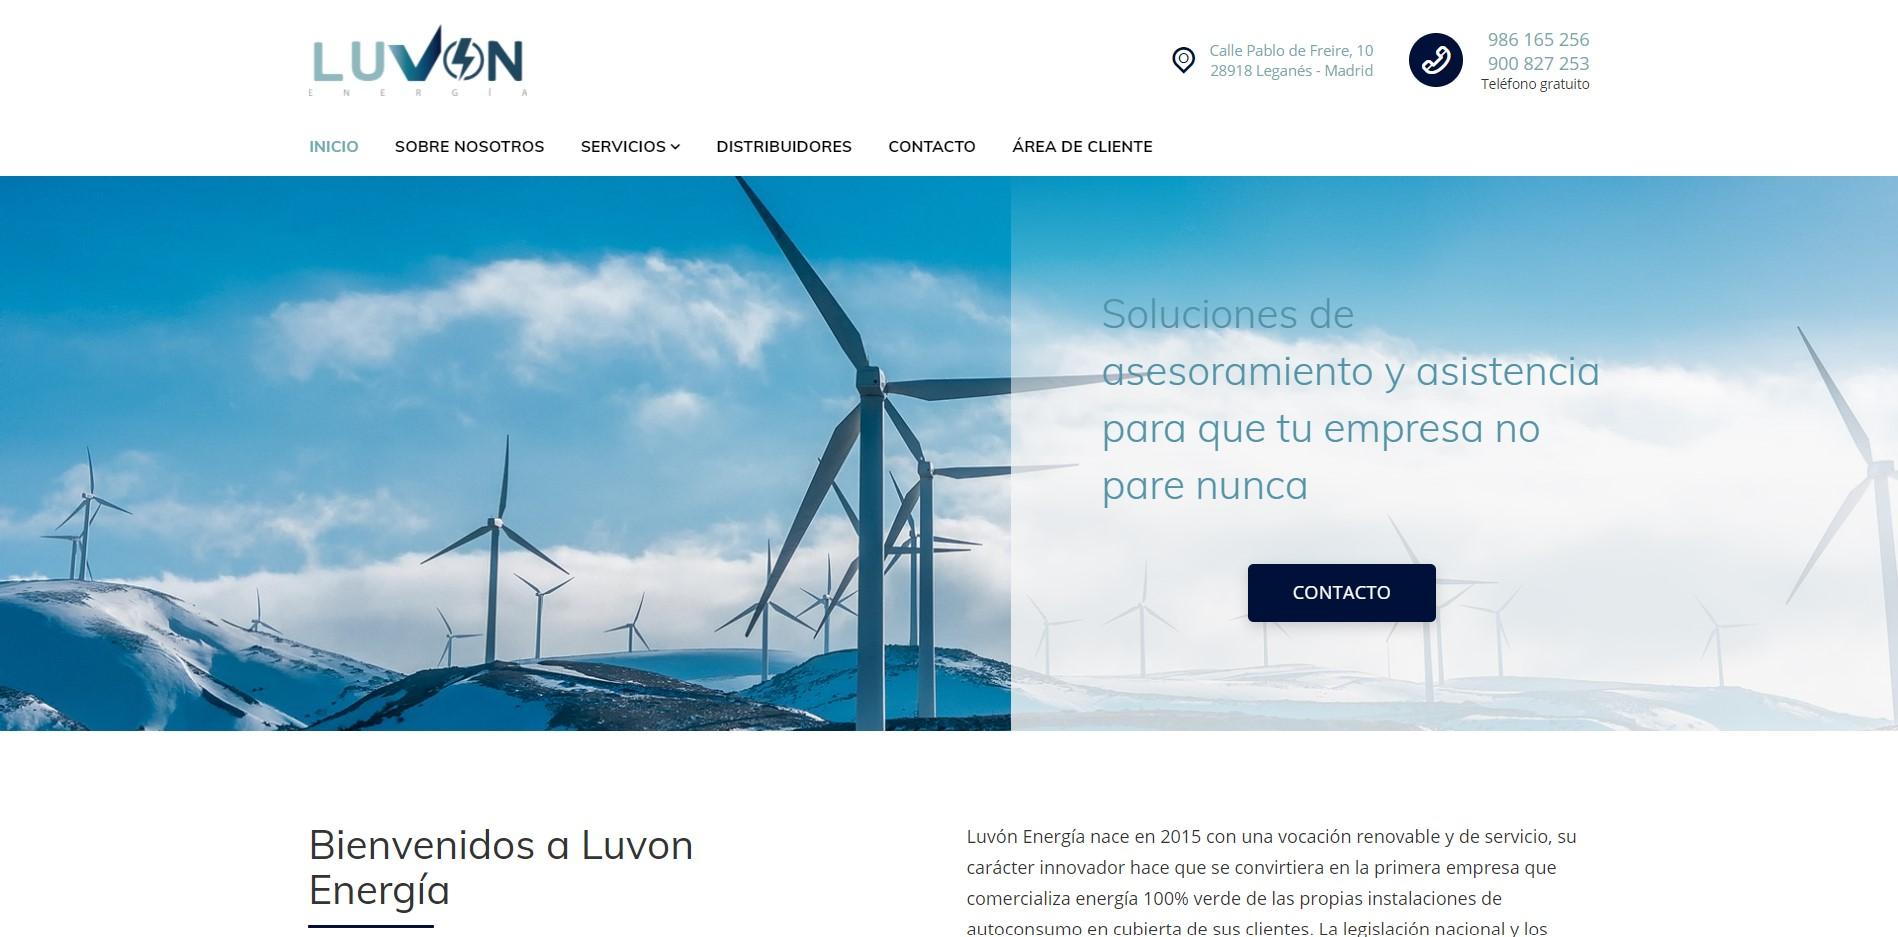 Luvon Energía